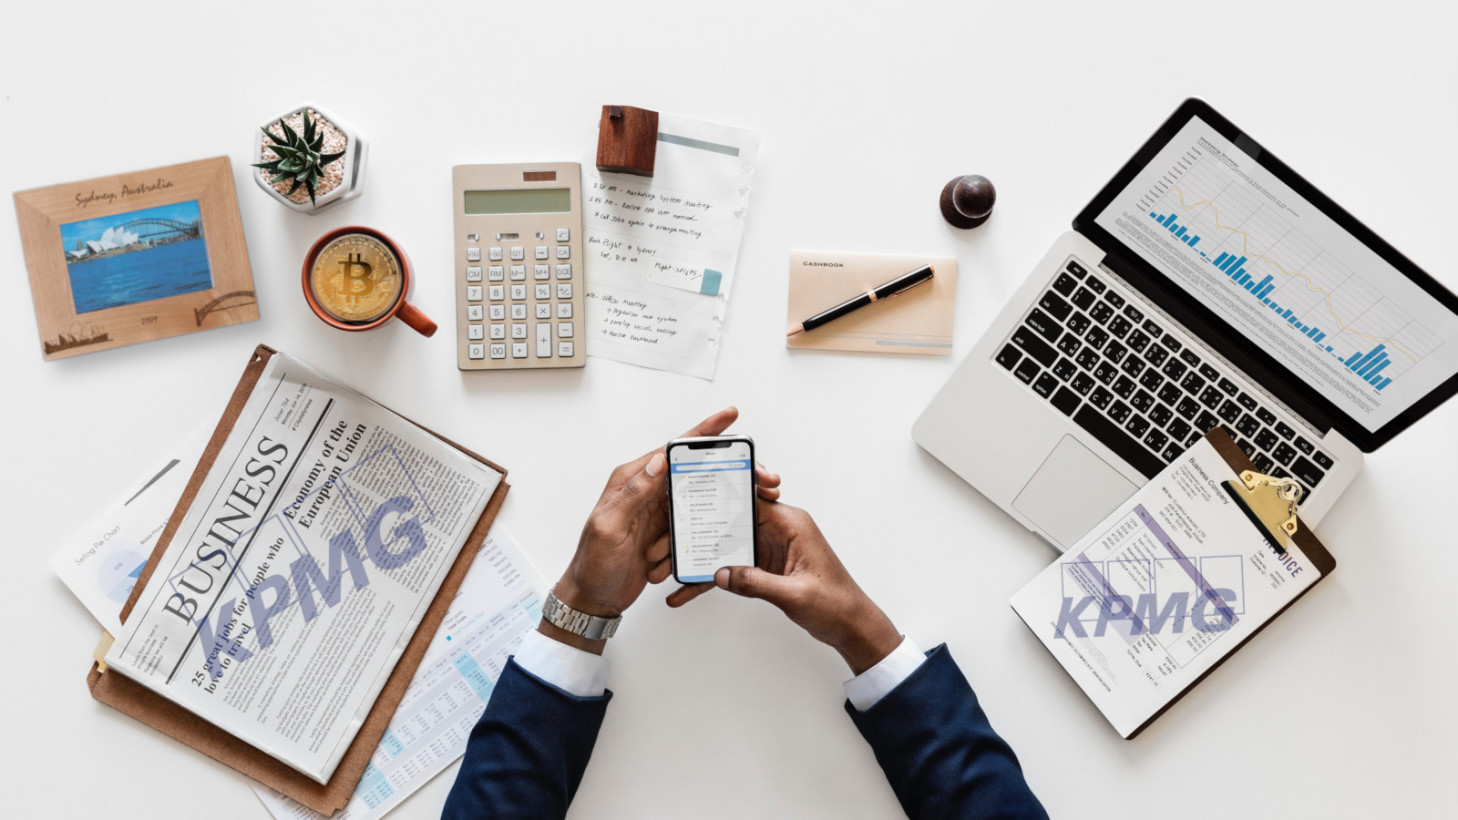 thenextweb.com - Matthew Beedham - KPMG launches Bitcoin tax estimator for Australian hodlers